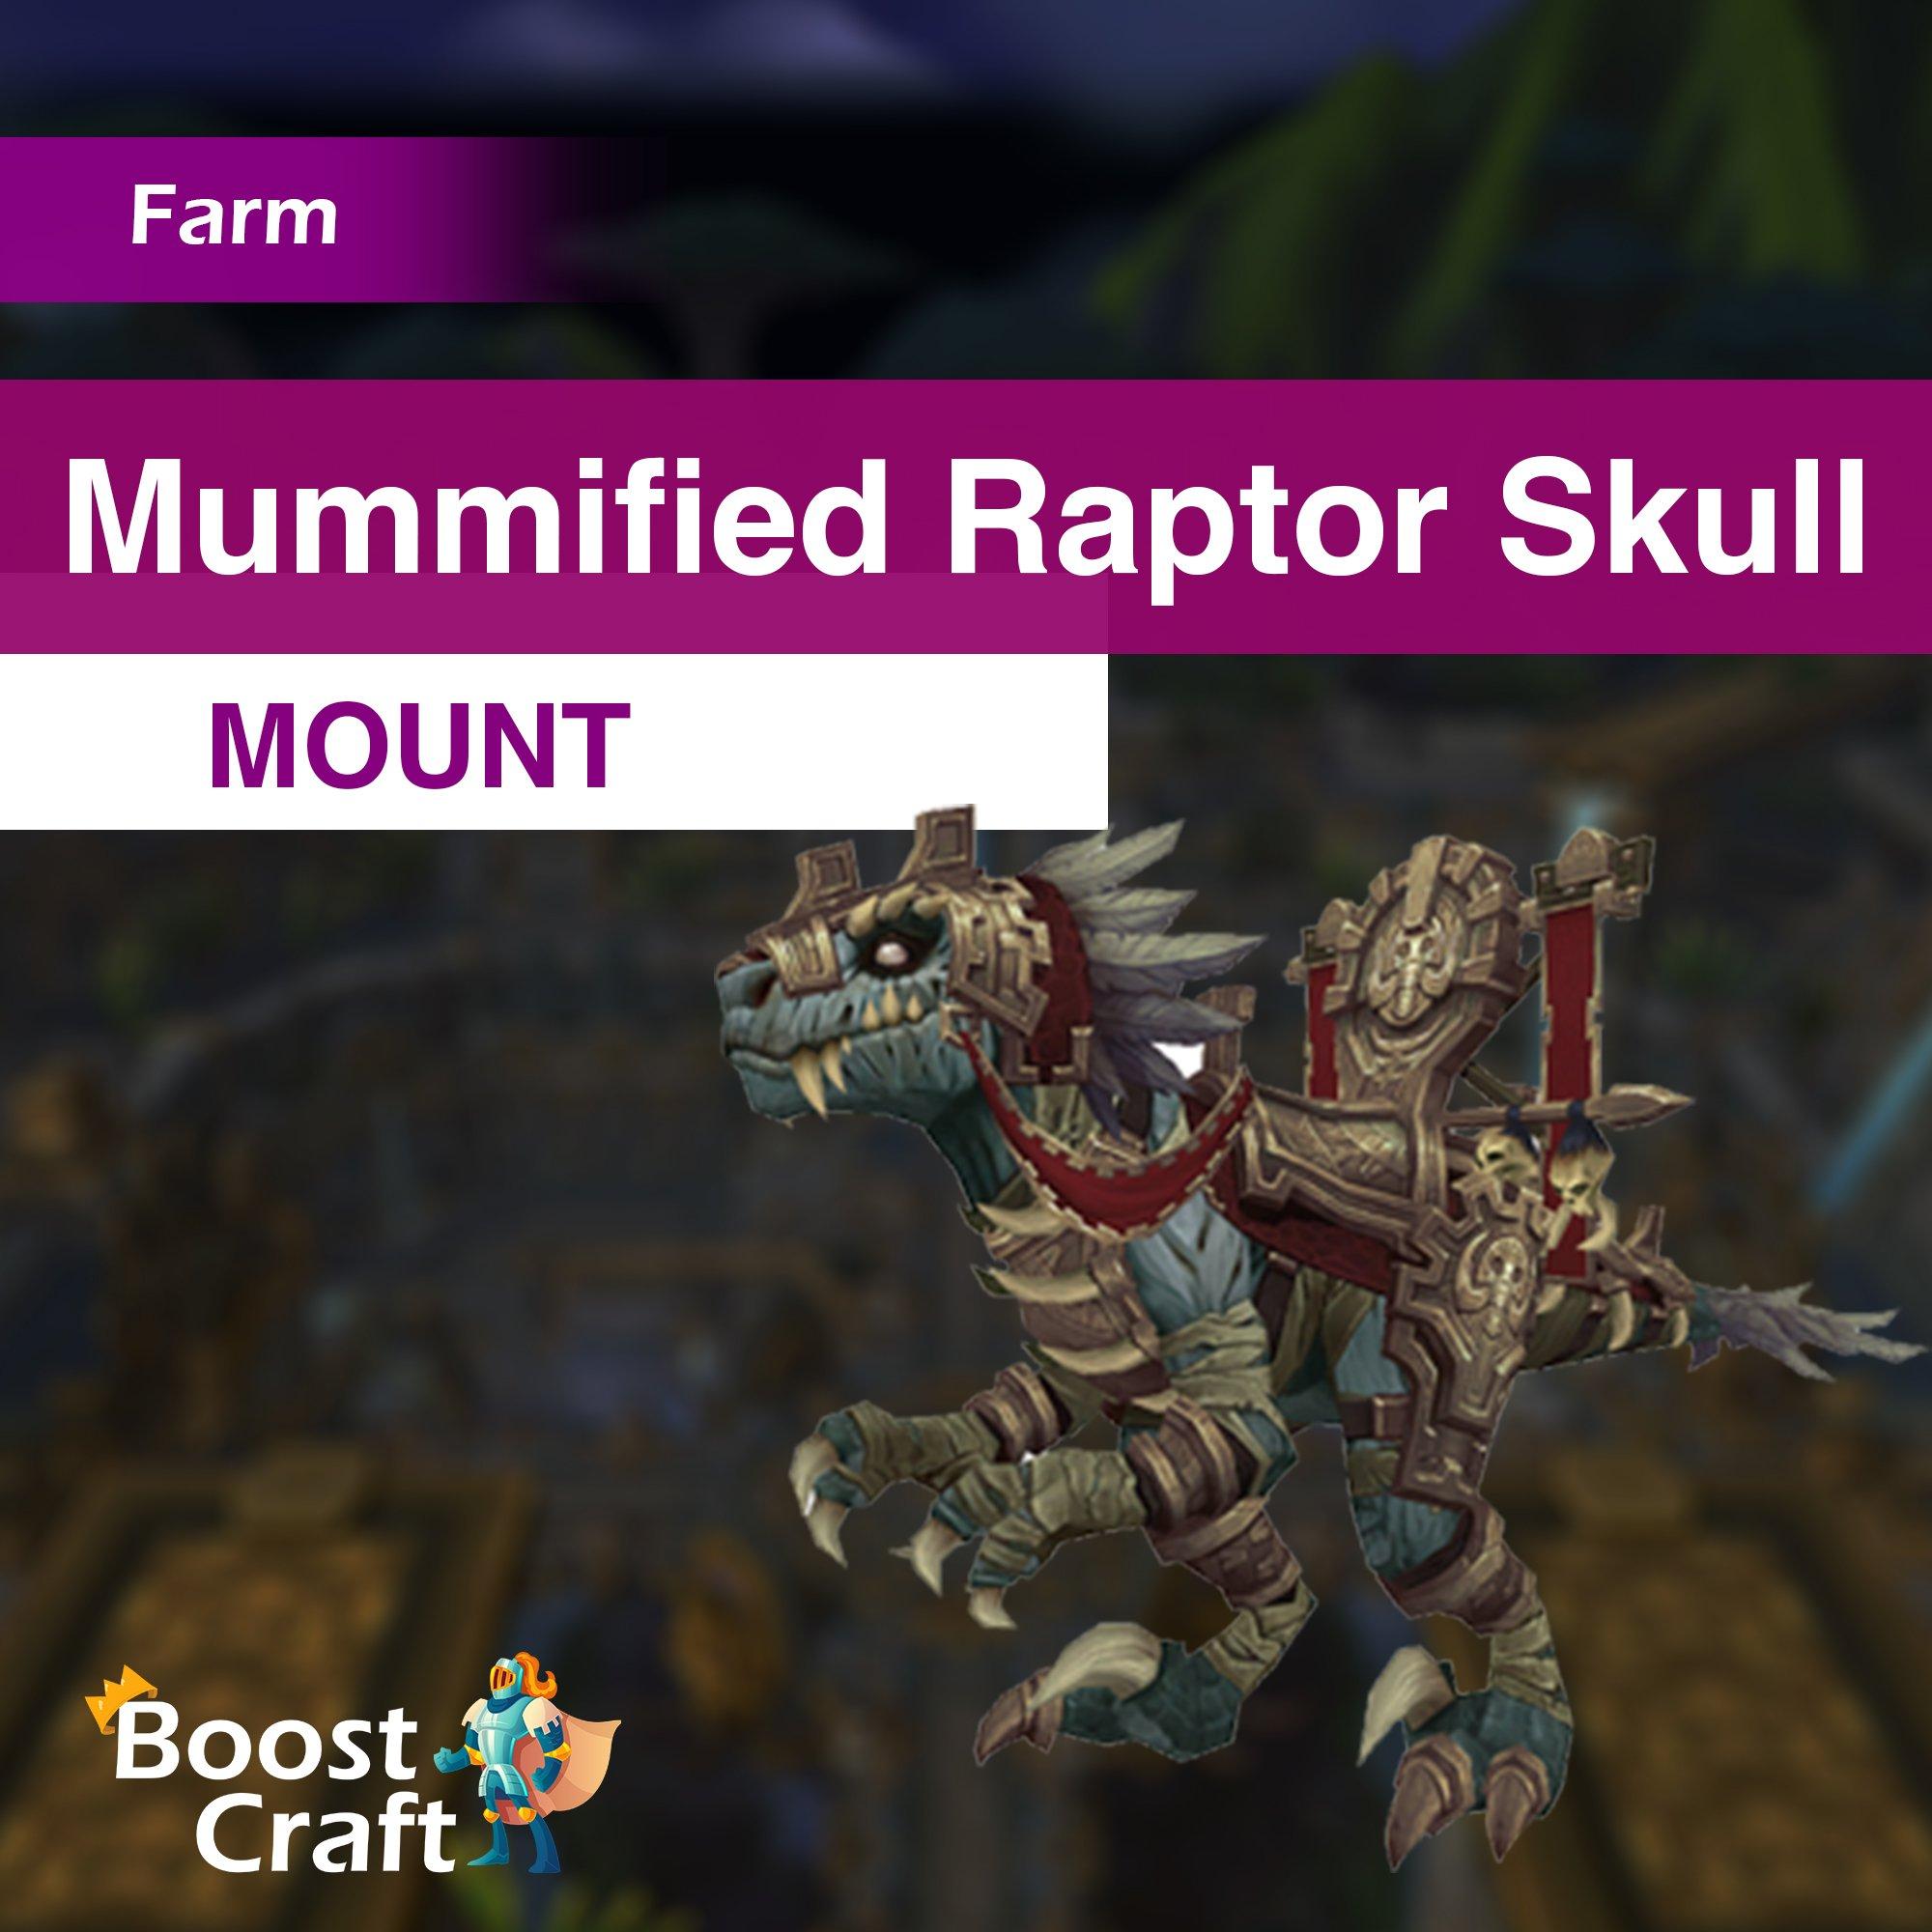 Mummified Raptor Skull – Mount Farm